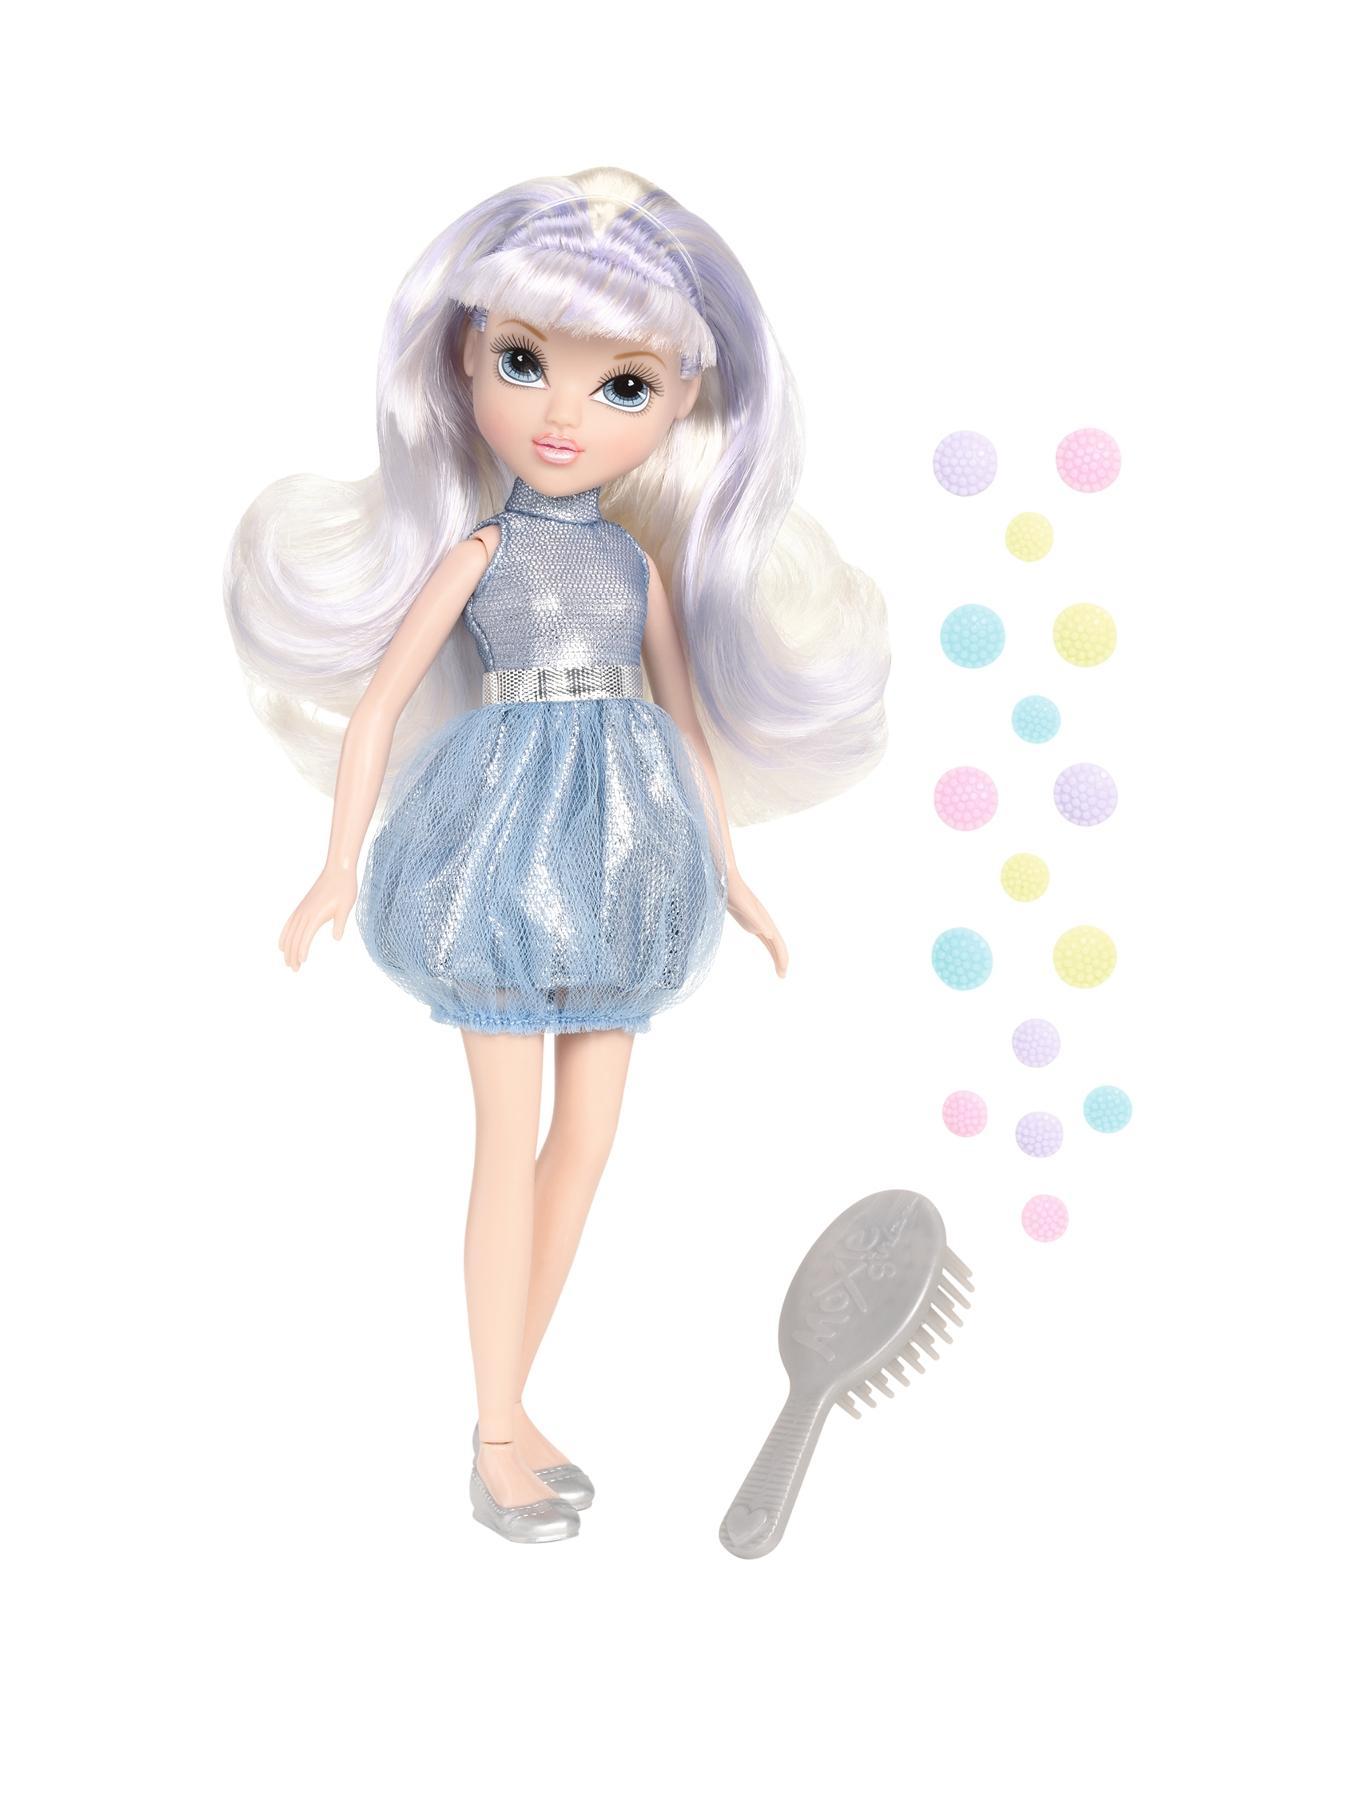 Moxie Girlz Snap n Style Doll - Avery